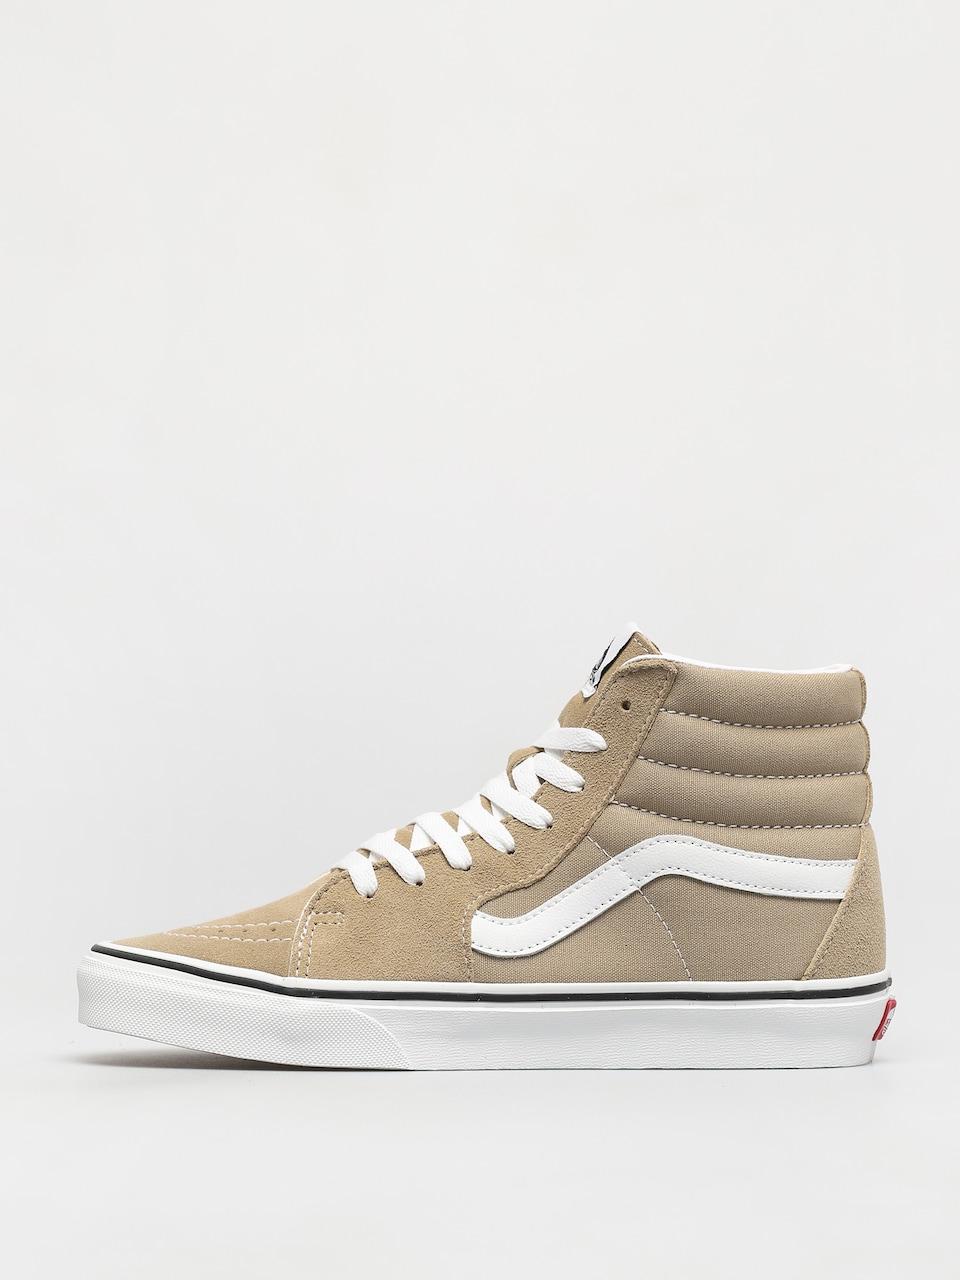 Vans Sk8 Hi Shoes (incense/true white)